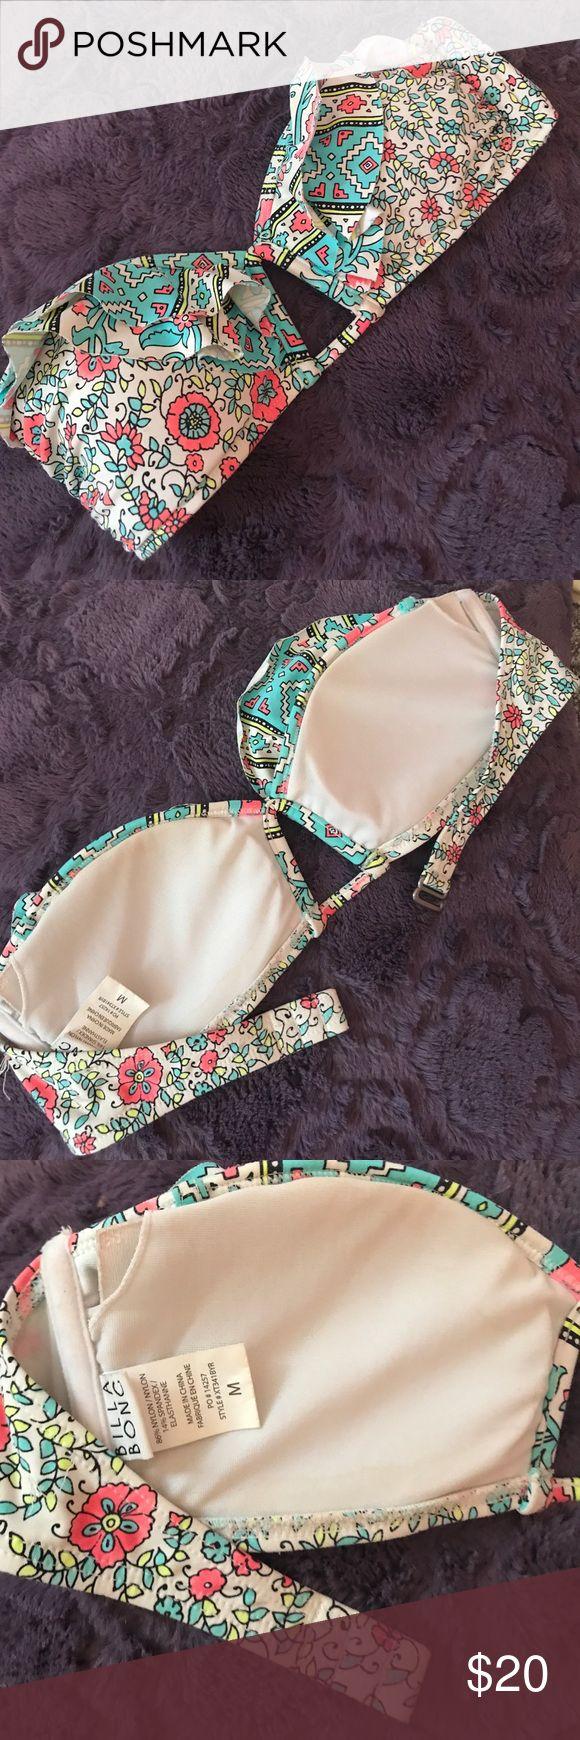 Billabong Strapless Bikini Top Neon bikini top with floral and aztec print. In perfect condition. Size Medium, worn a few times. Billabong Swim Bikinis